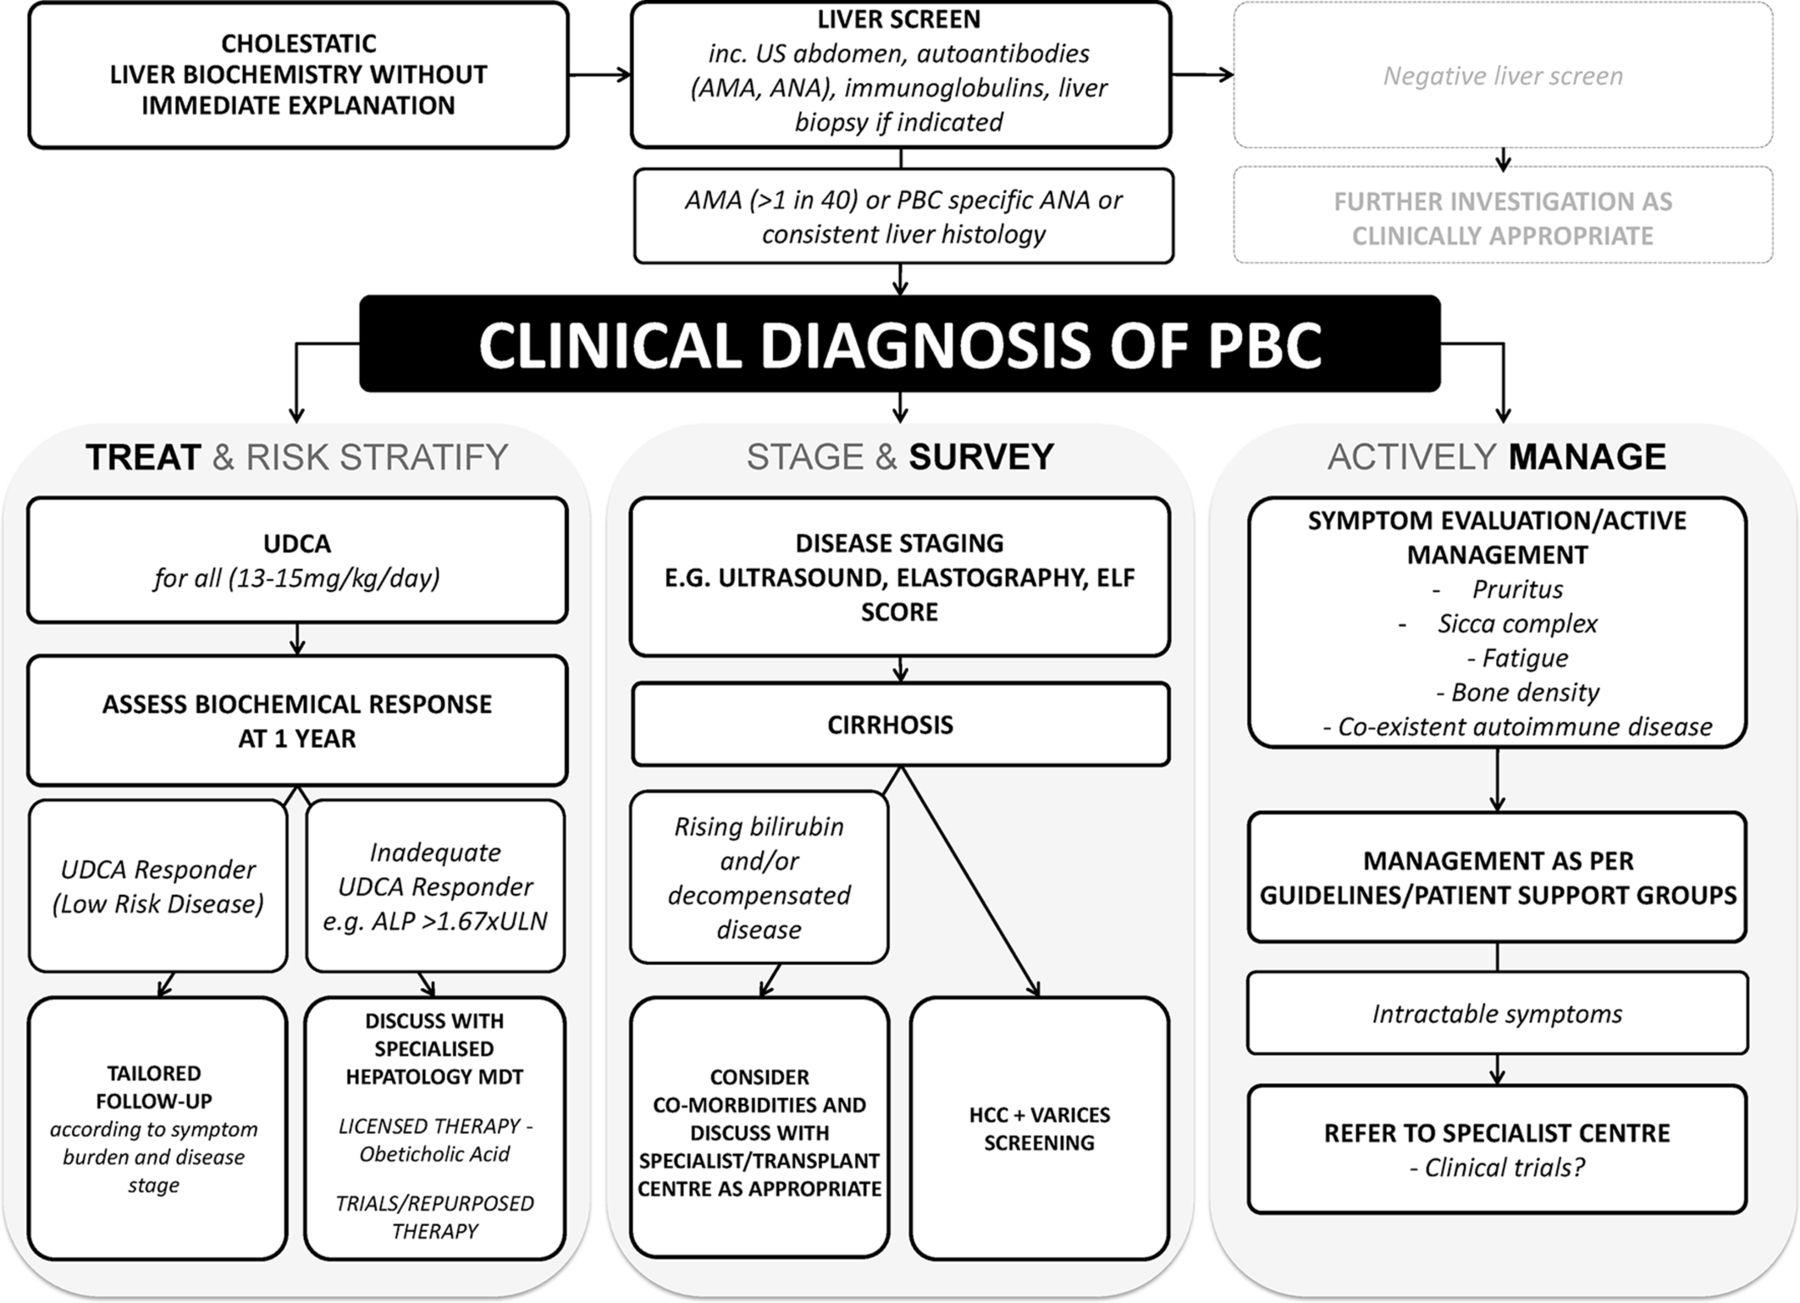 The British Society of Gastroenterology/UK-PBC primary